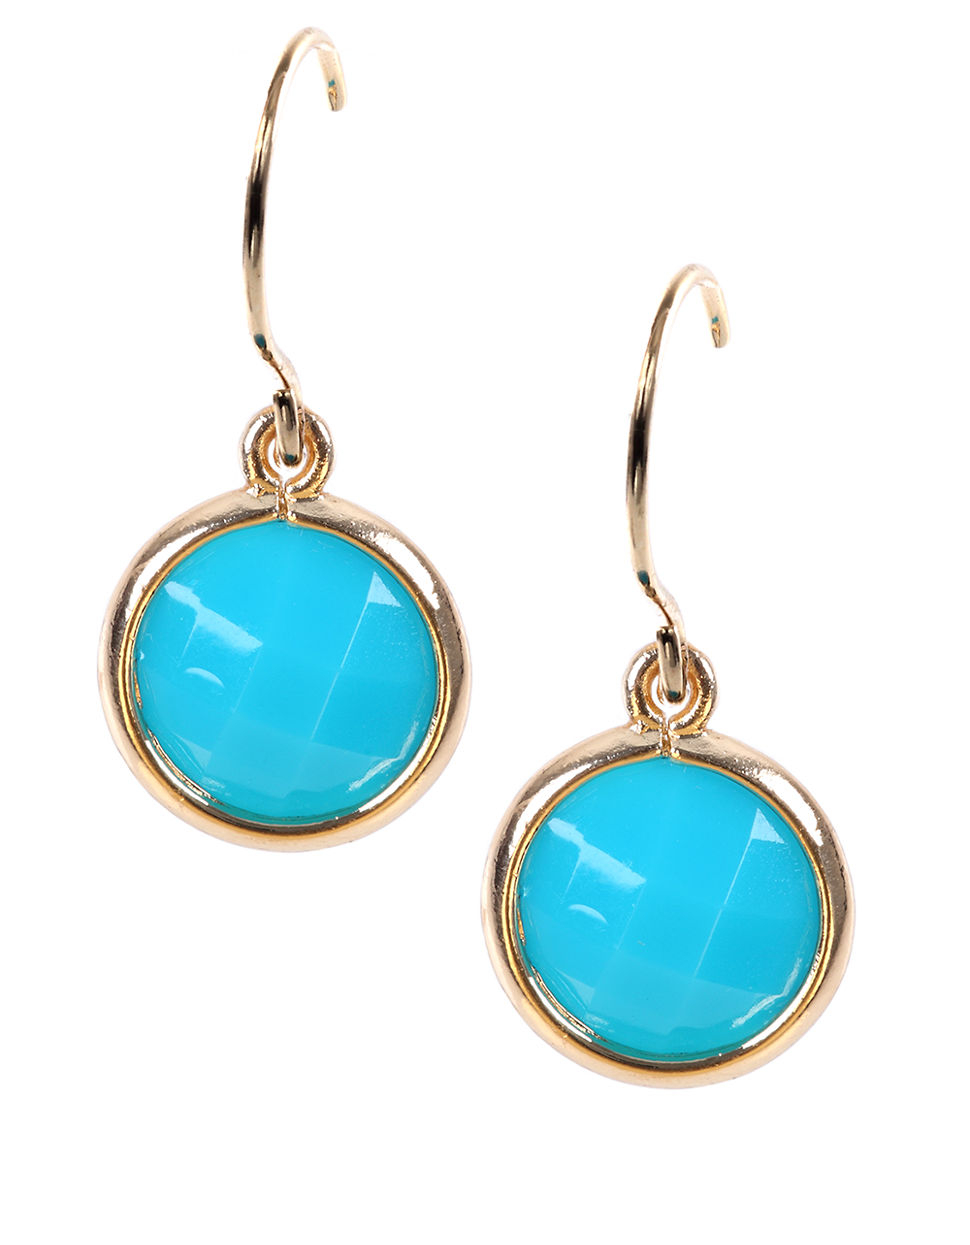 anne klein goldtone turquoise stone drop earrings in blue. Black Bedroom Furniture Sets. Home Design Ideas